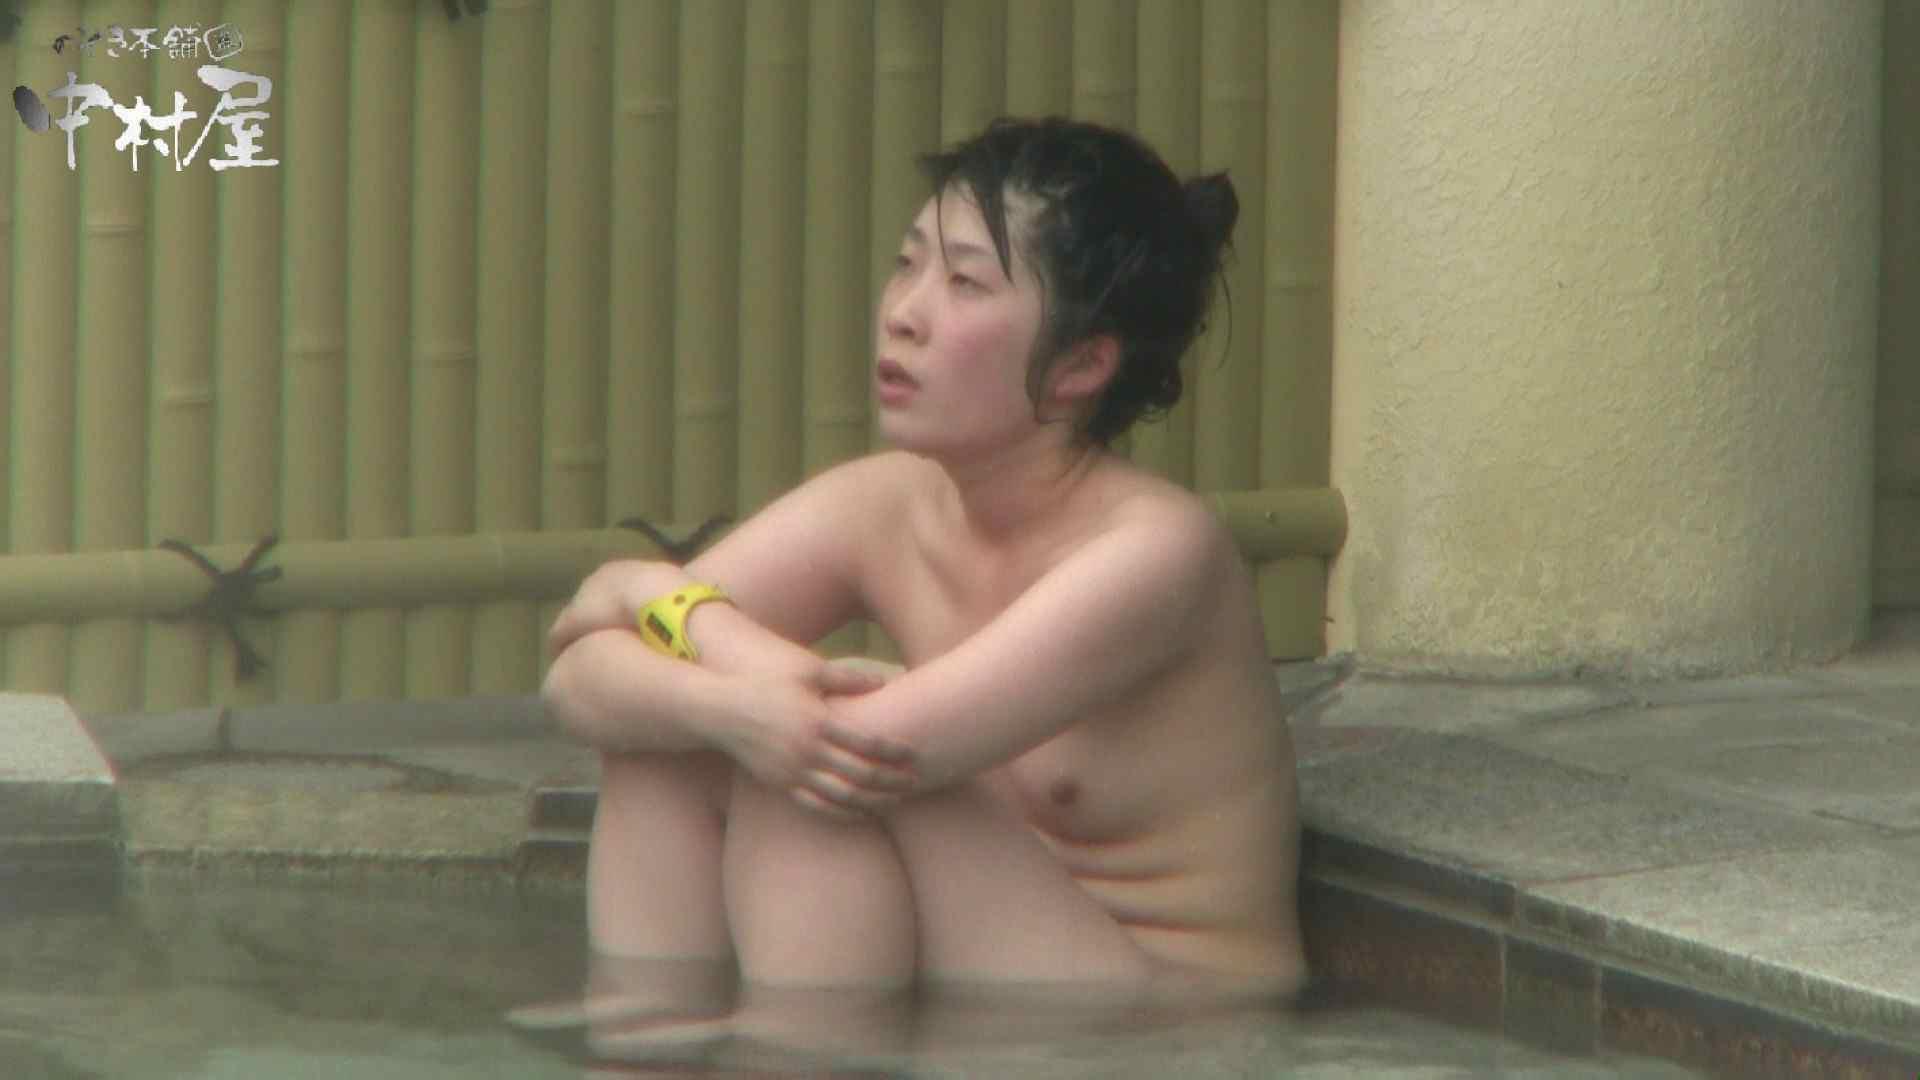 Aquaな露天風呂Vol.955 盗撮師作品  85pic 51